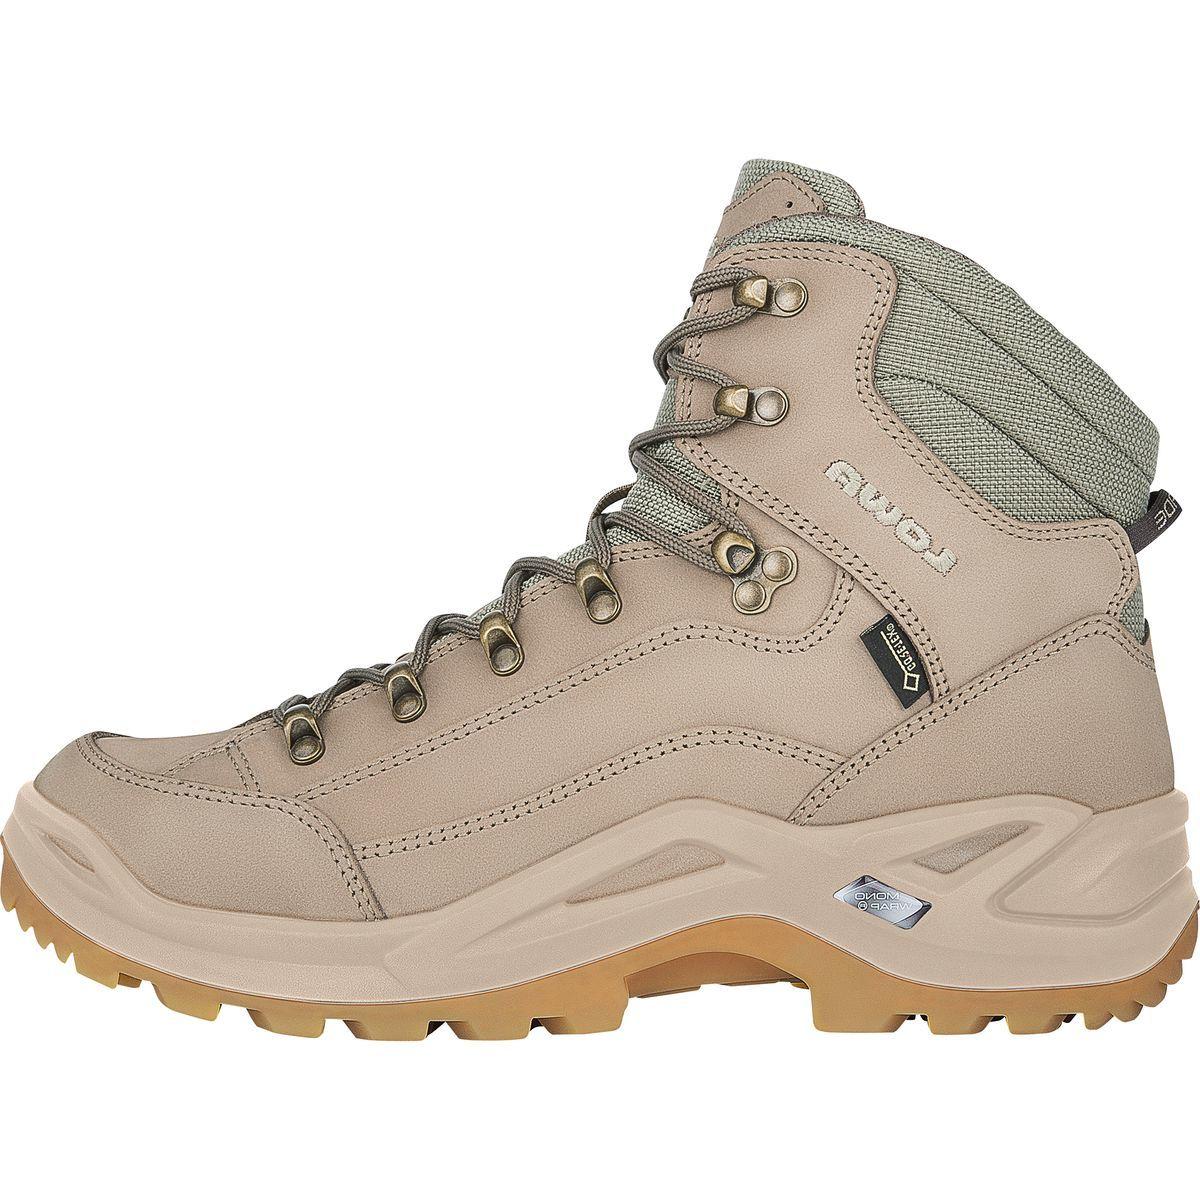 Lowa Renegade GTX Mid Hiking Boot - Men's